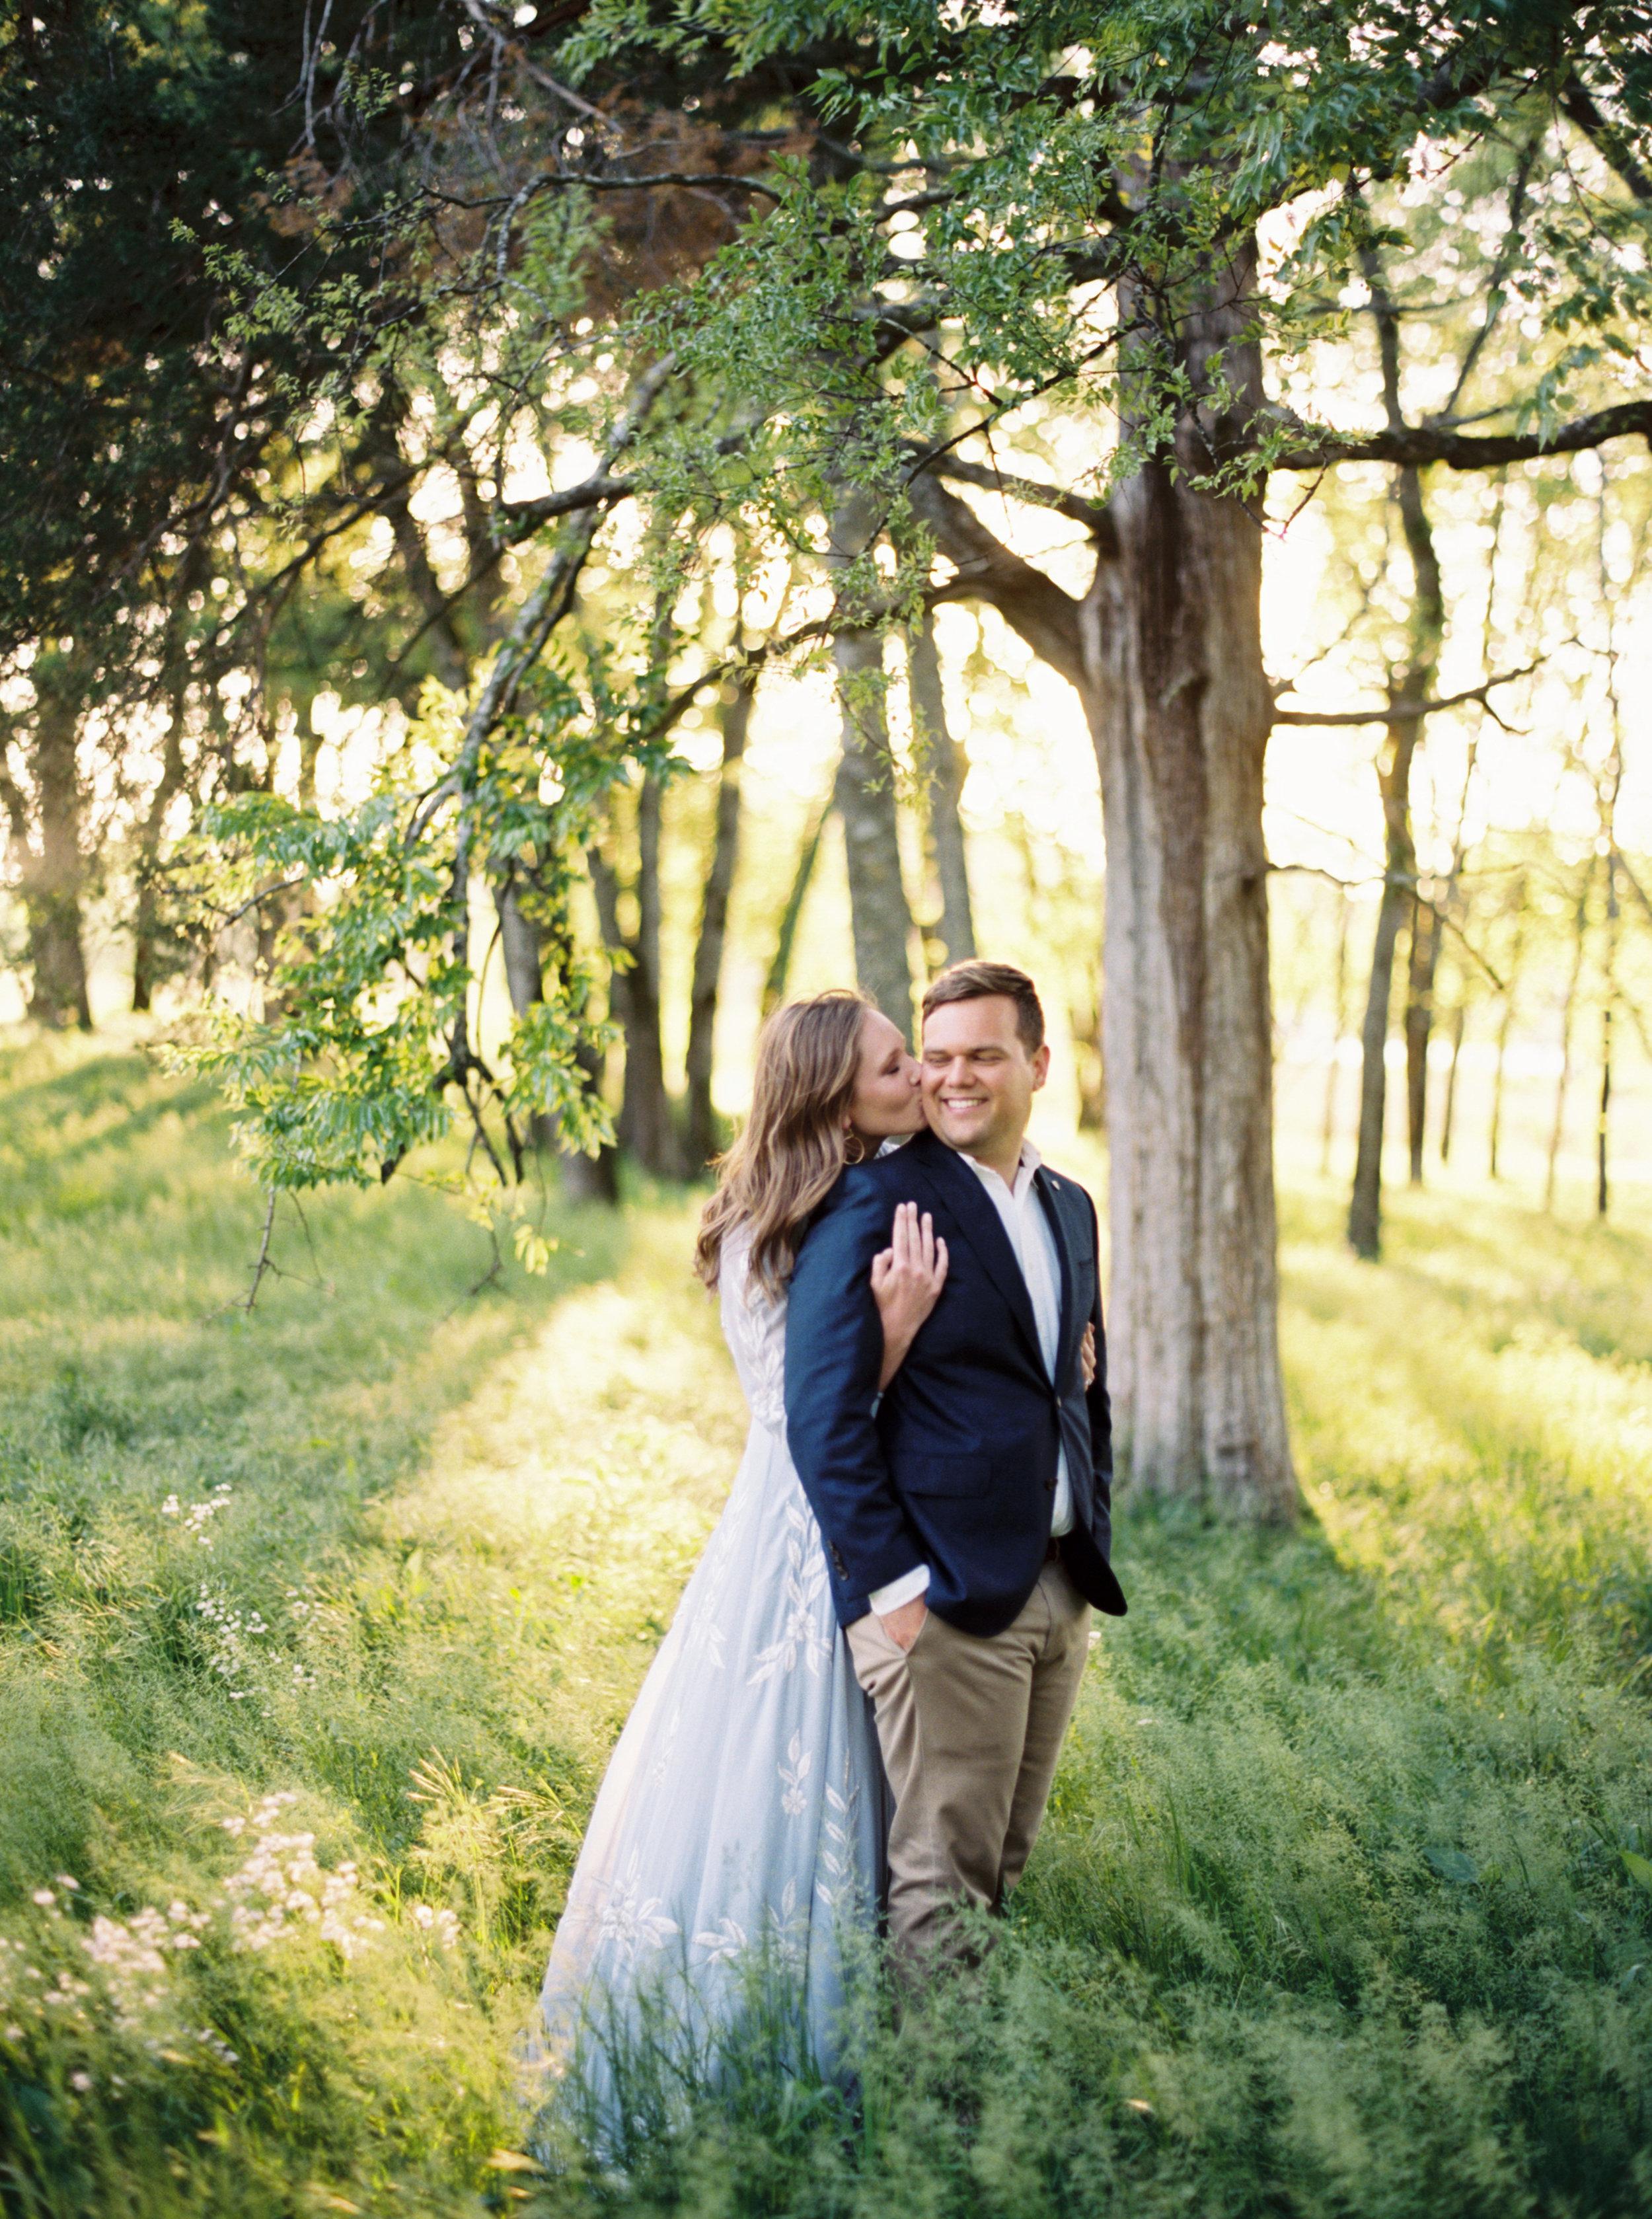 Emma_Ethan_Engagement_Marblegate_Farm_Knozville_Abigail_Malone_Photography-131.jpg